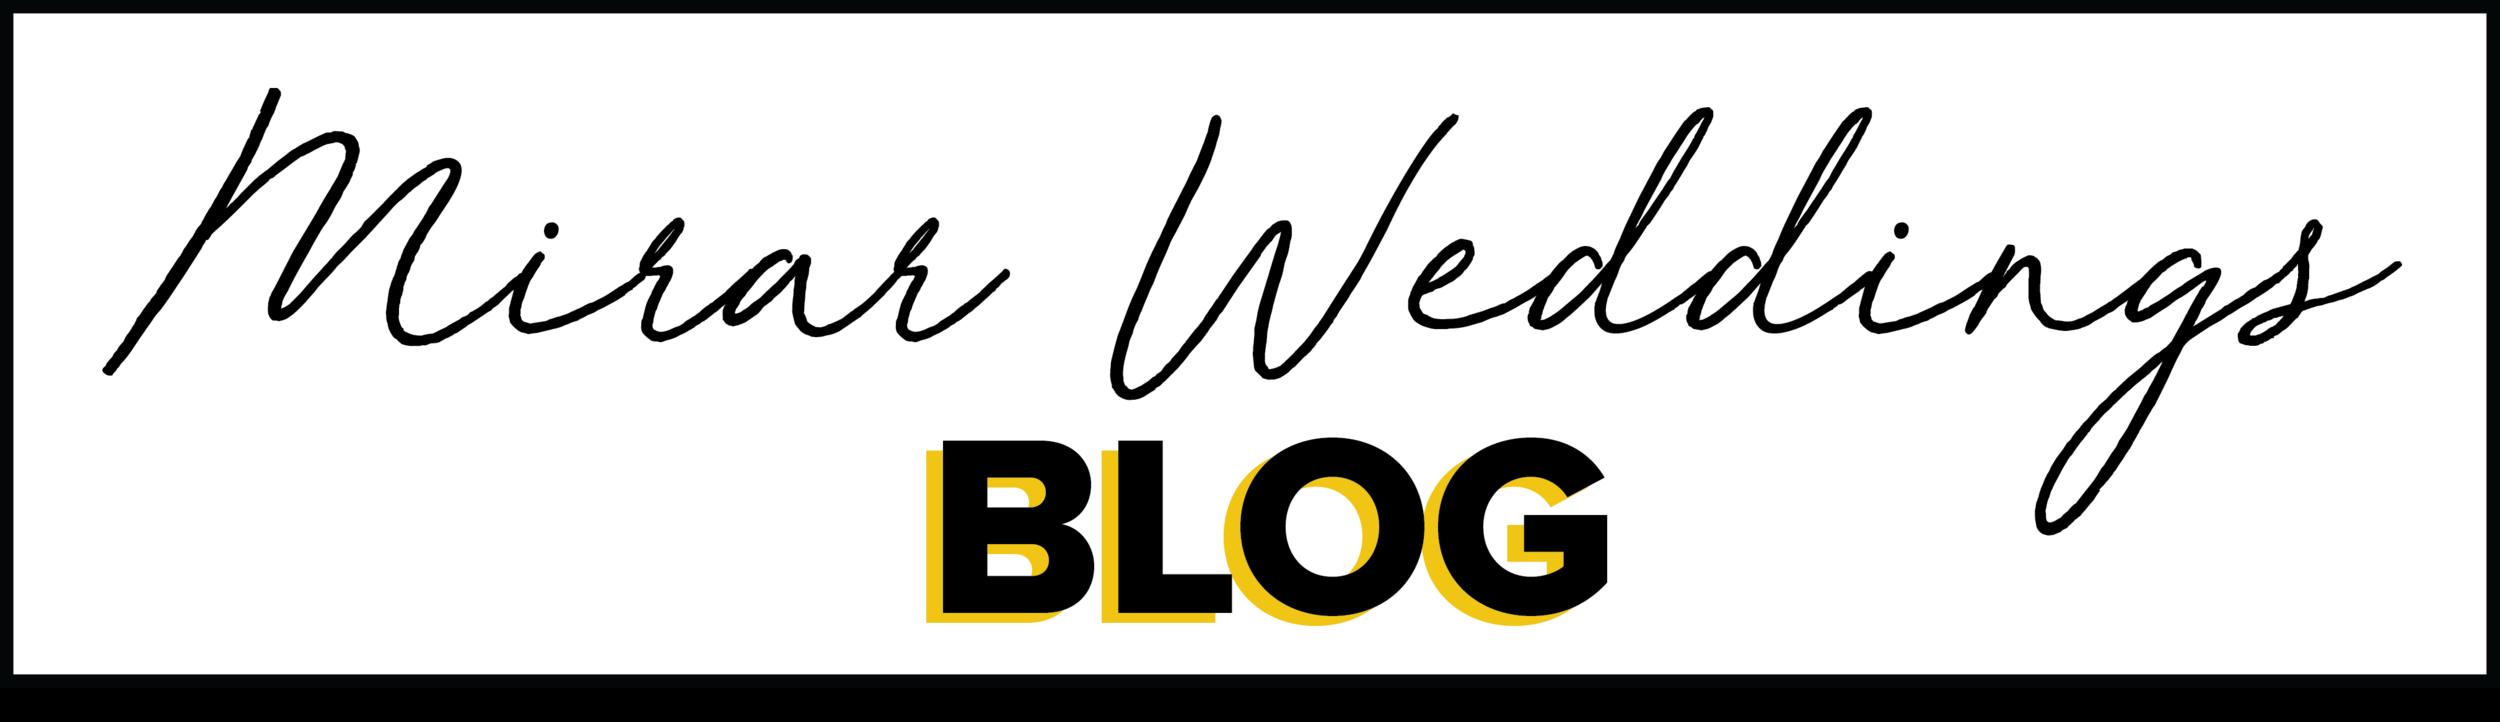 Mirar Weddings Blog.png